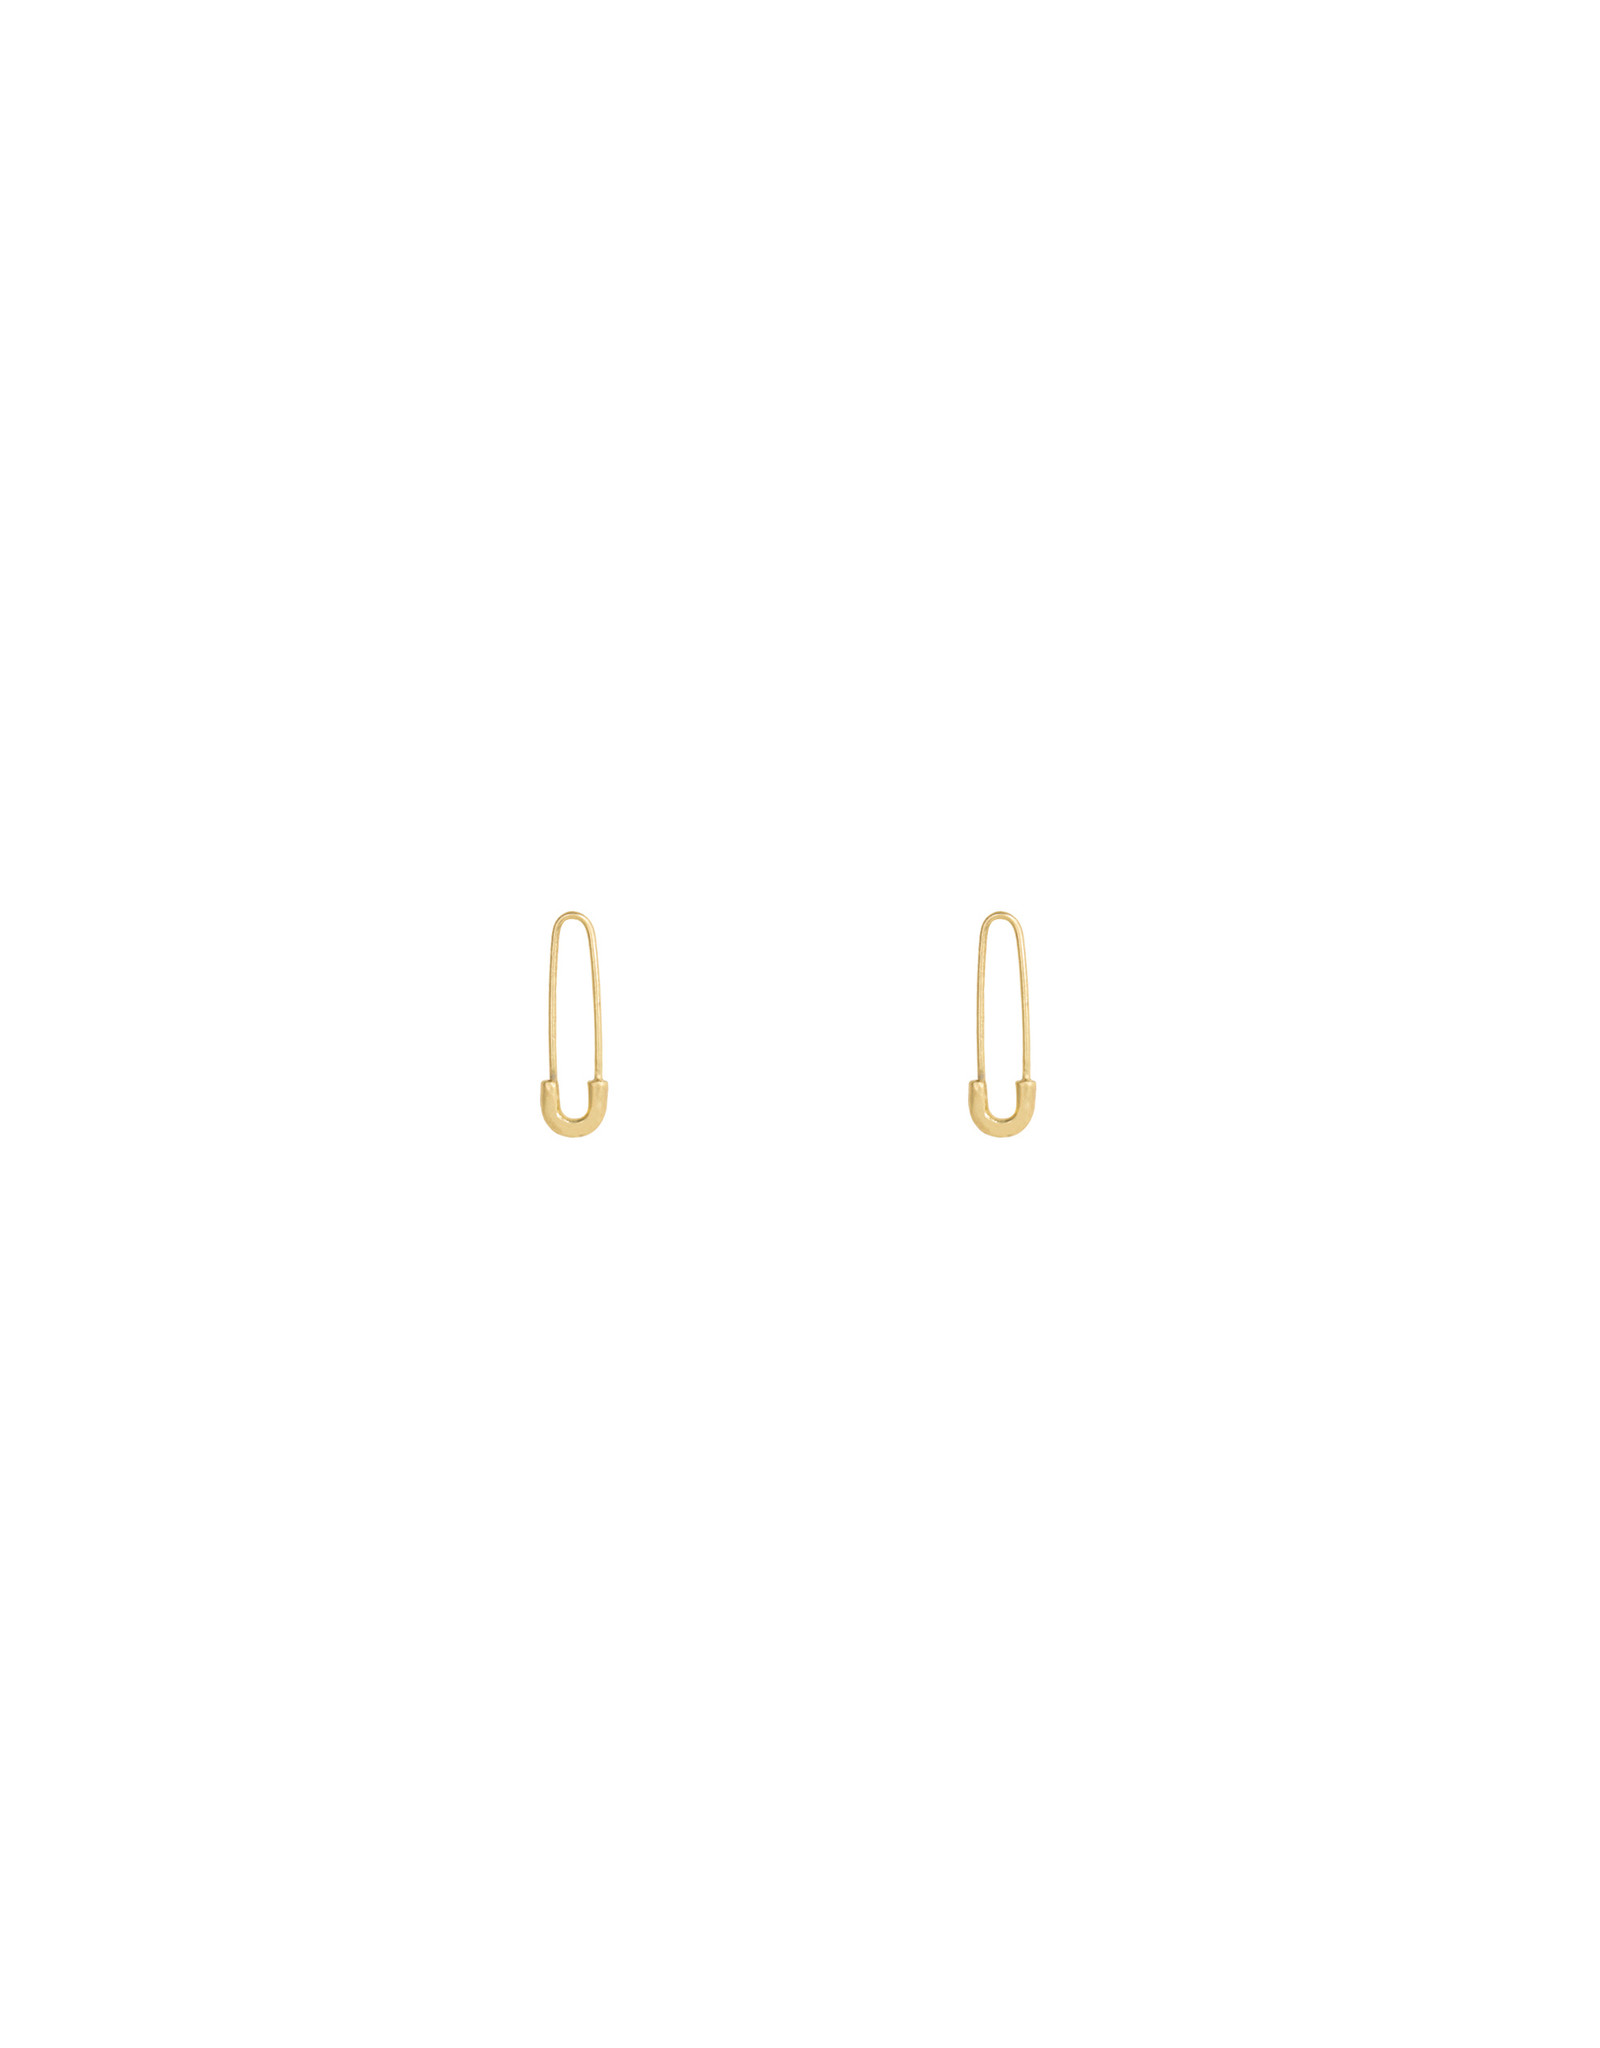 AARNA CLOTHING PIN EARRING